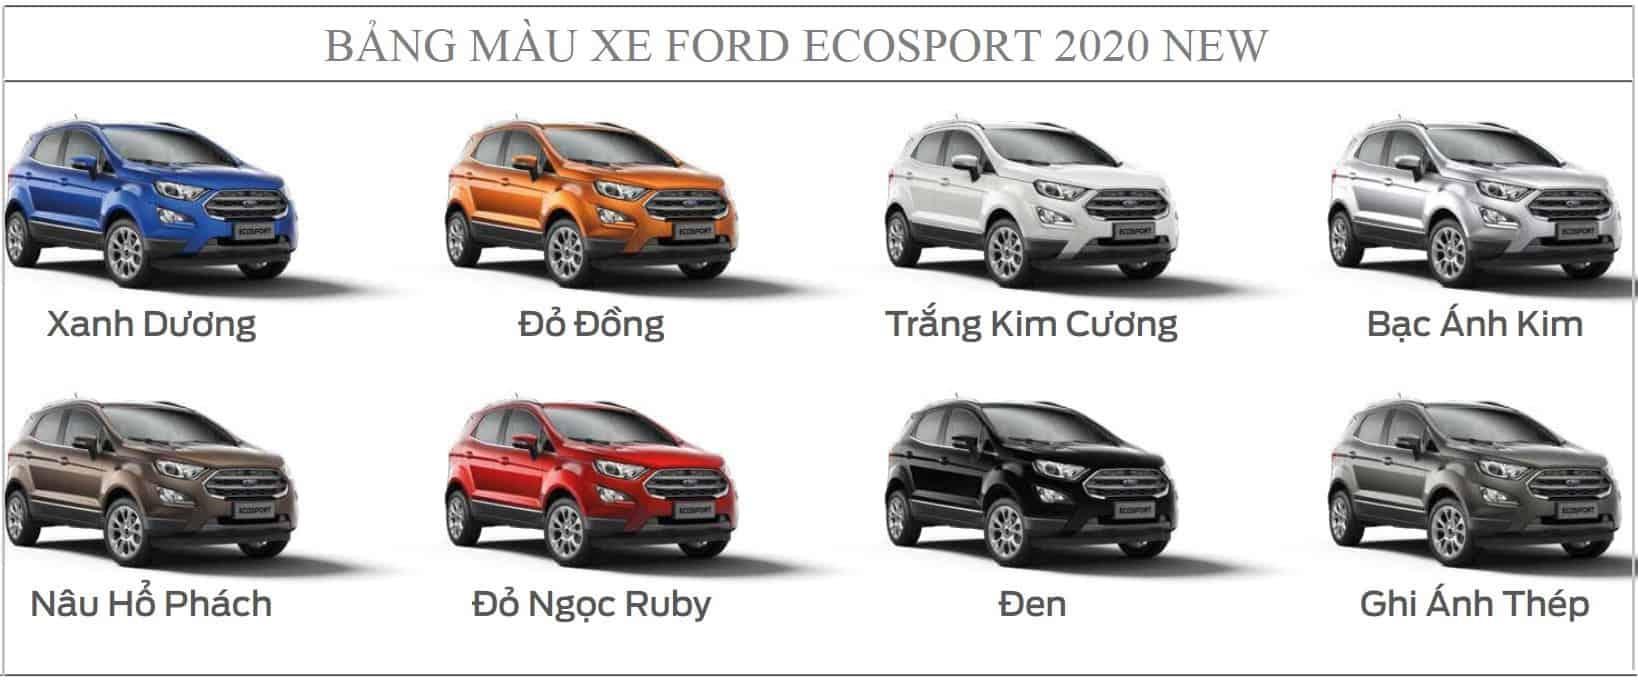 mau xe ford ecosport 2020 moi 1